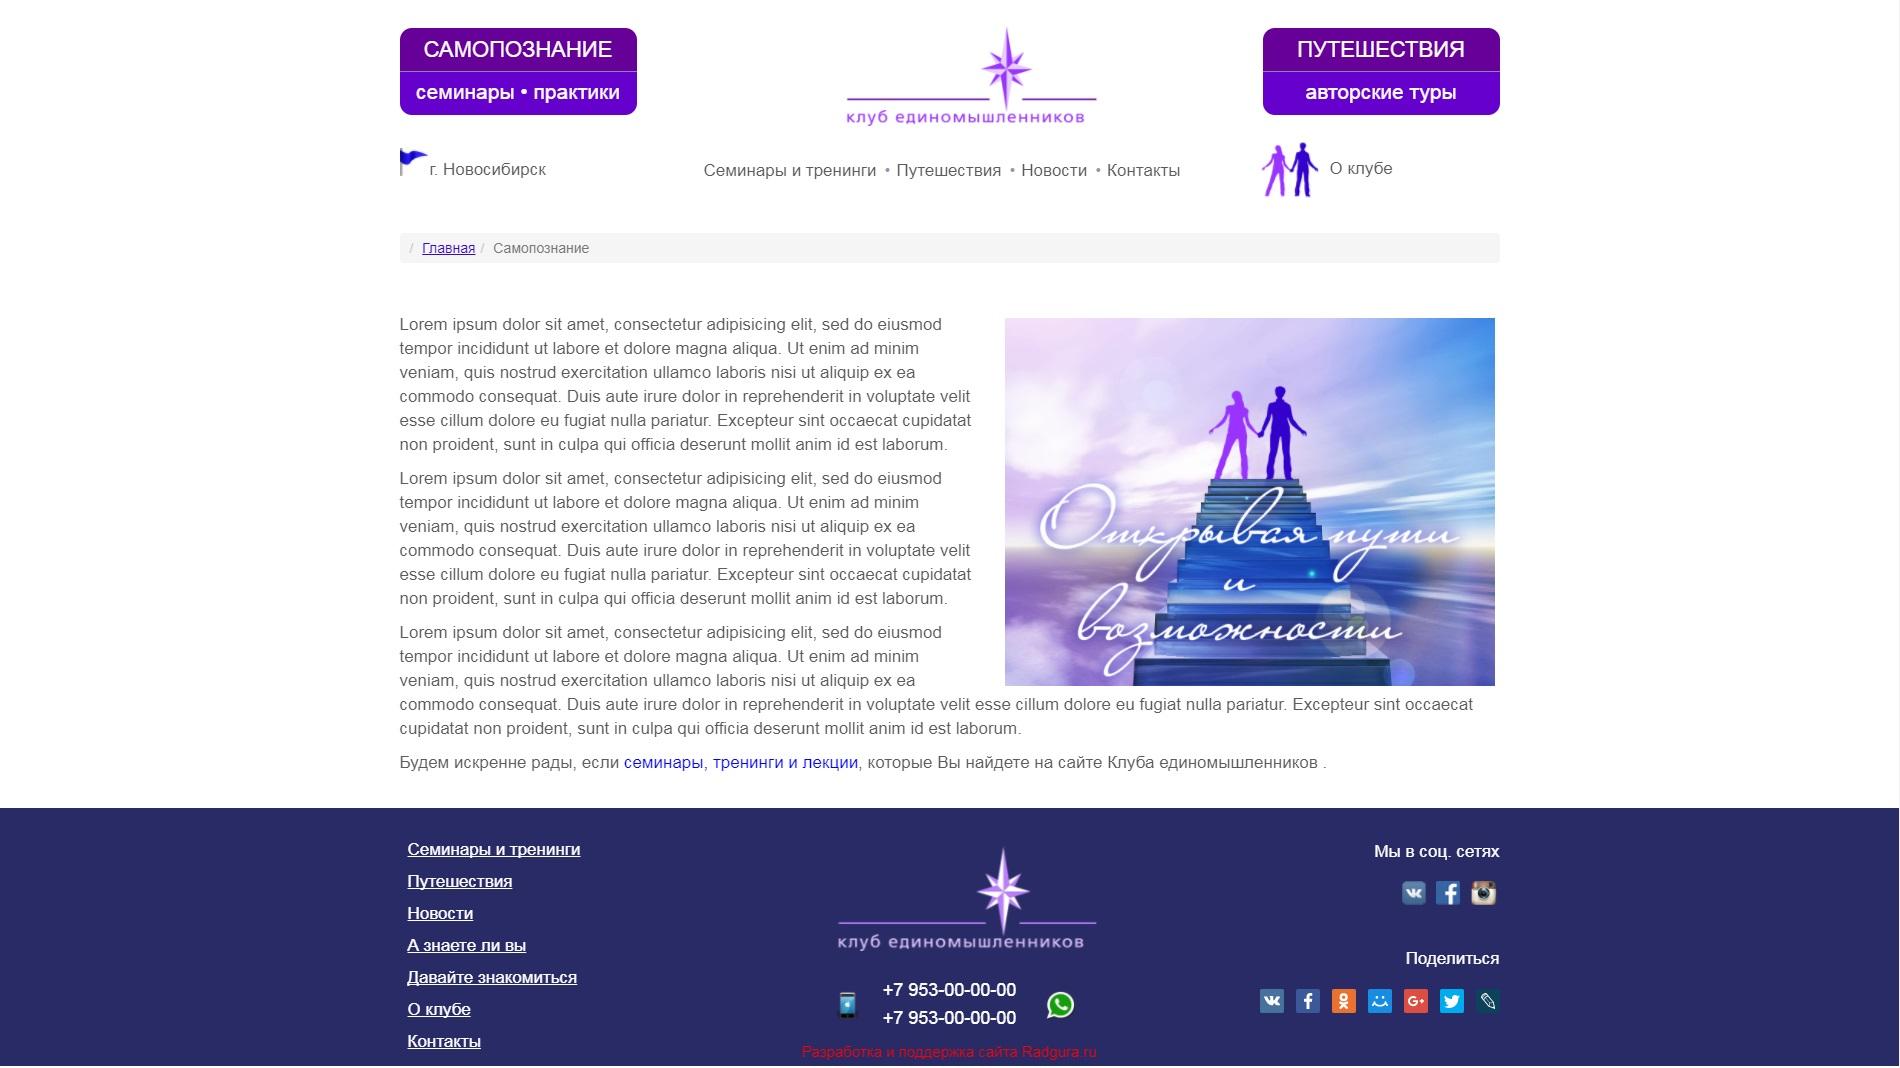 страница - самопознание - шапка сайта